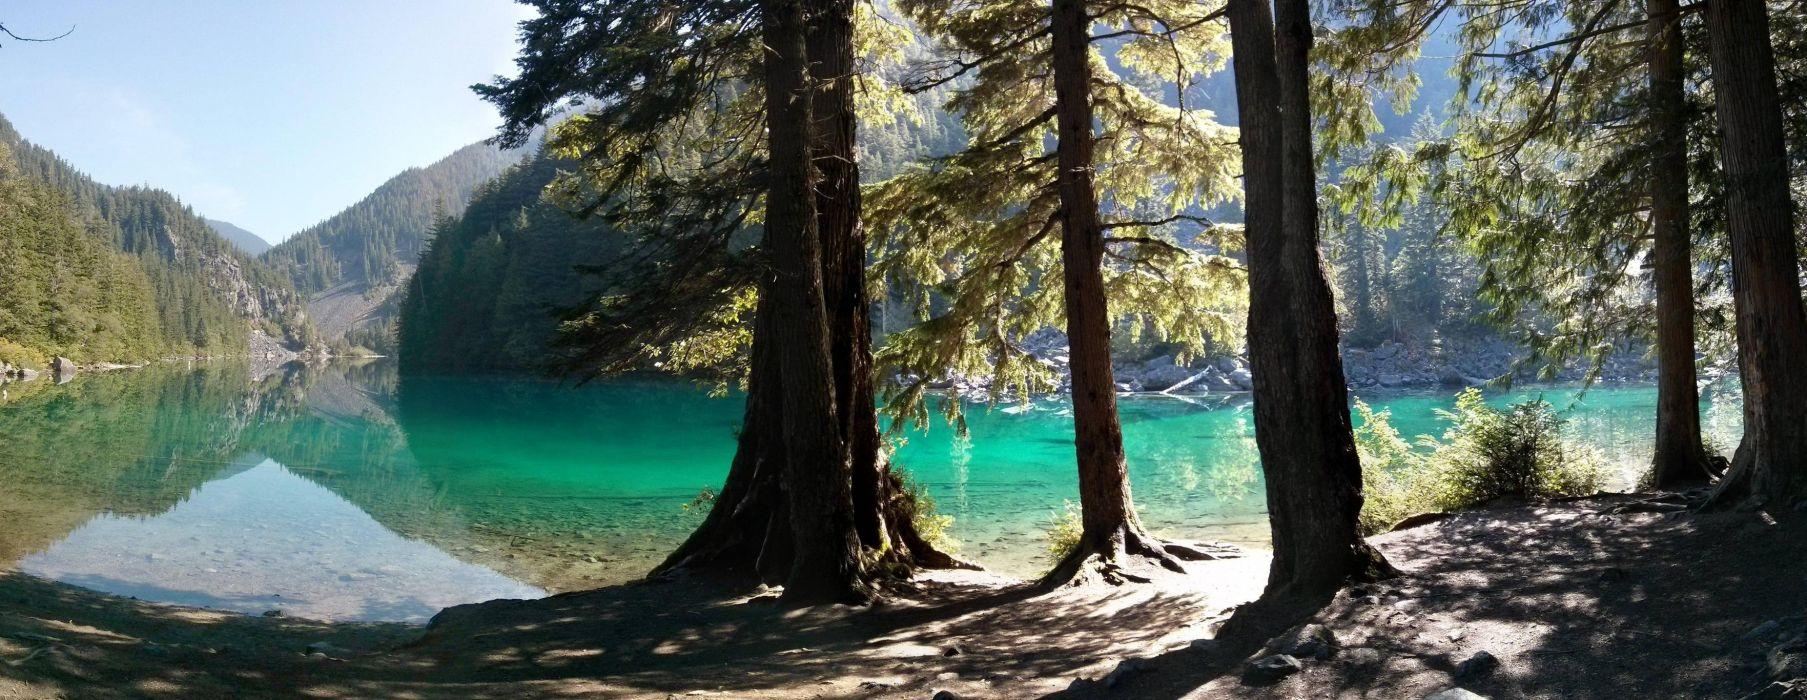 Lake Lindeman reflection forest trees British Columbia beach shore wallpaper